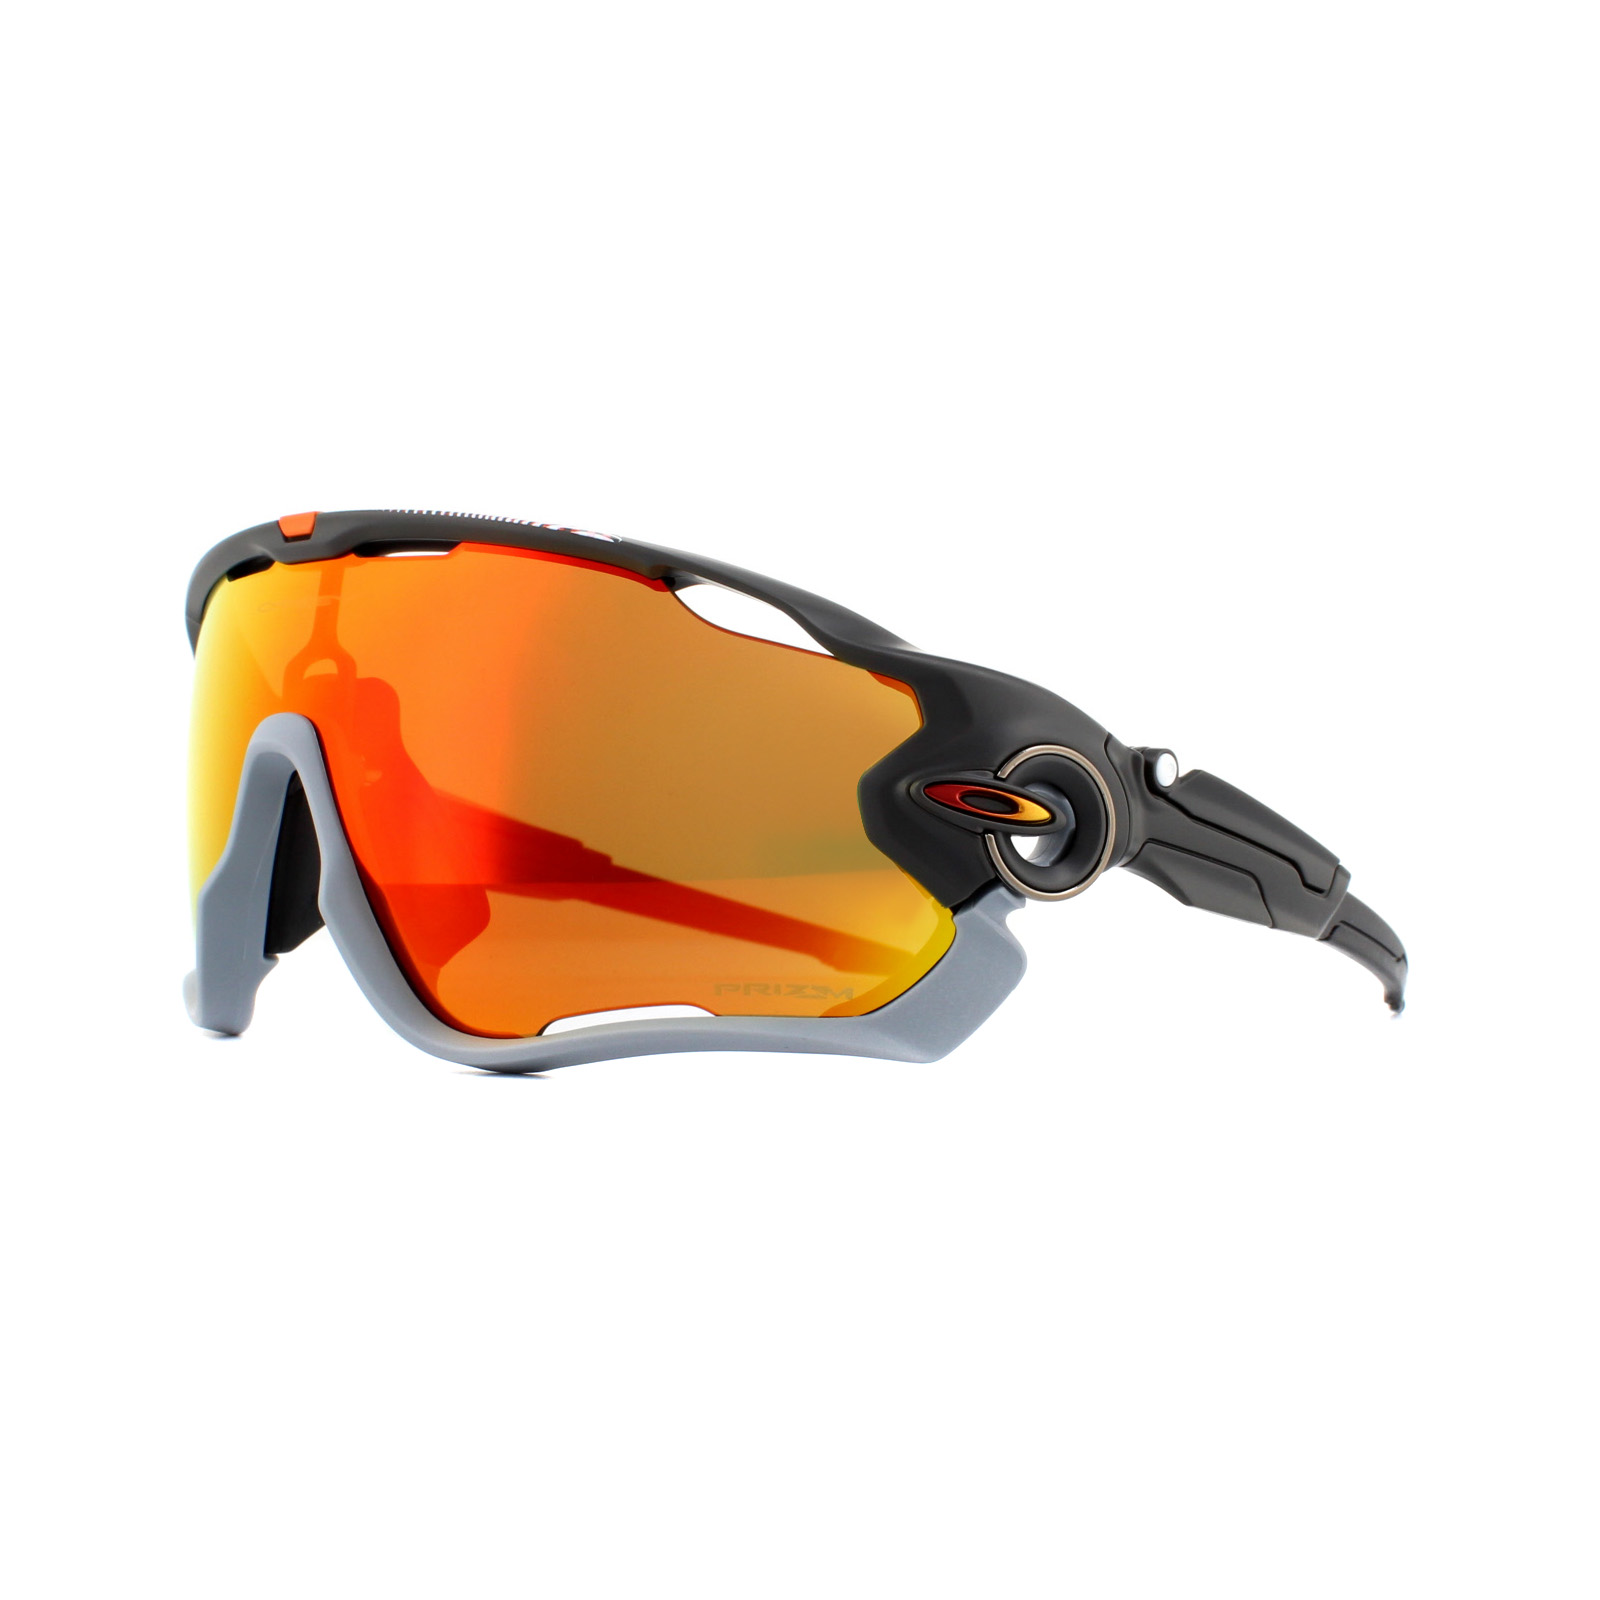 60ea7815bb3 Cheap Oakley Jawbreaker Sunglasses - Discounted Sunglasses